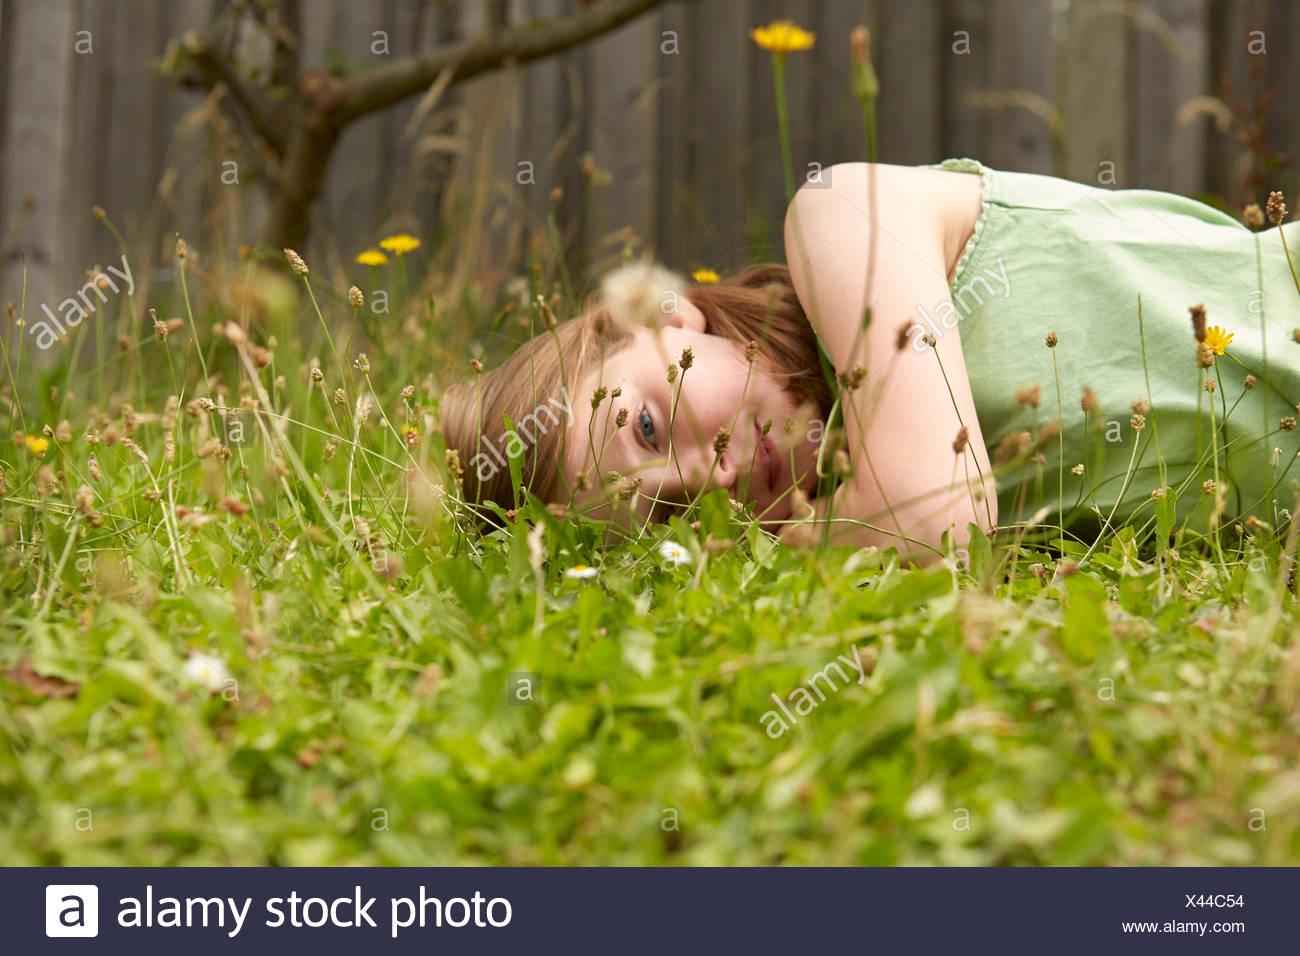 Girl lying on garden grass daydreaming - Stock Image